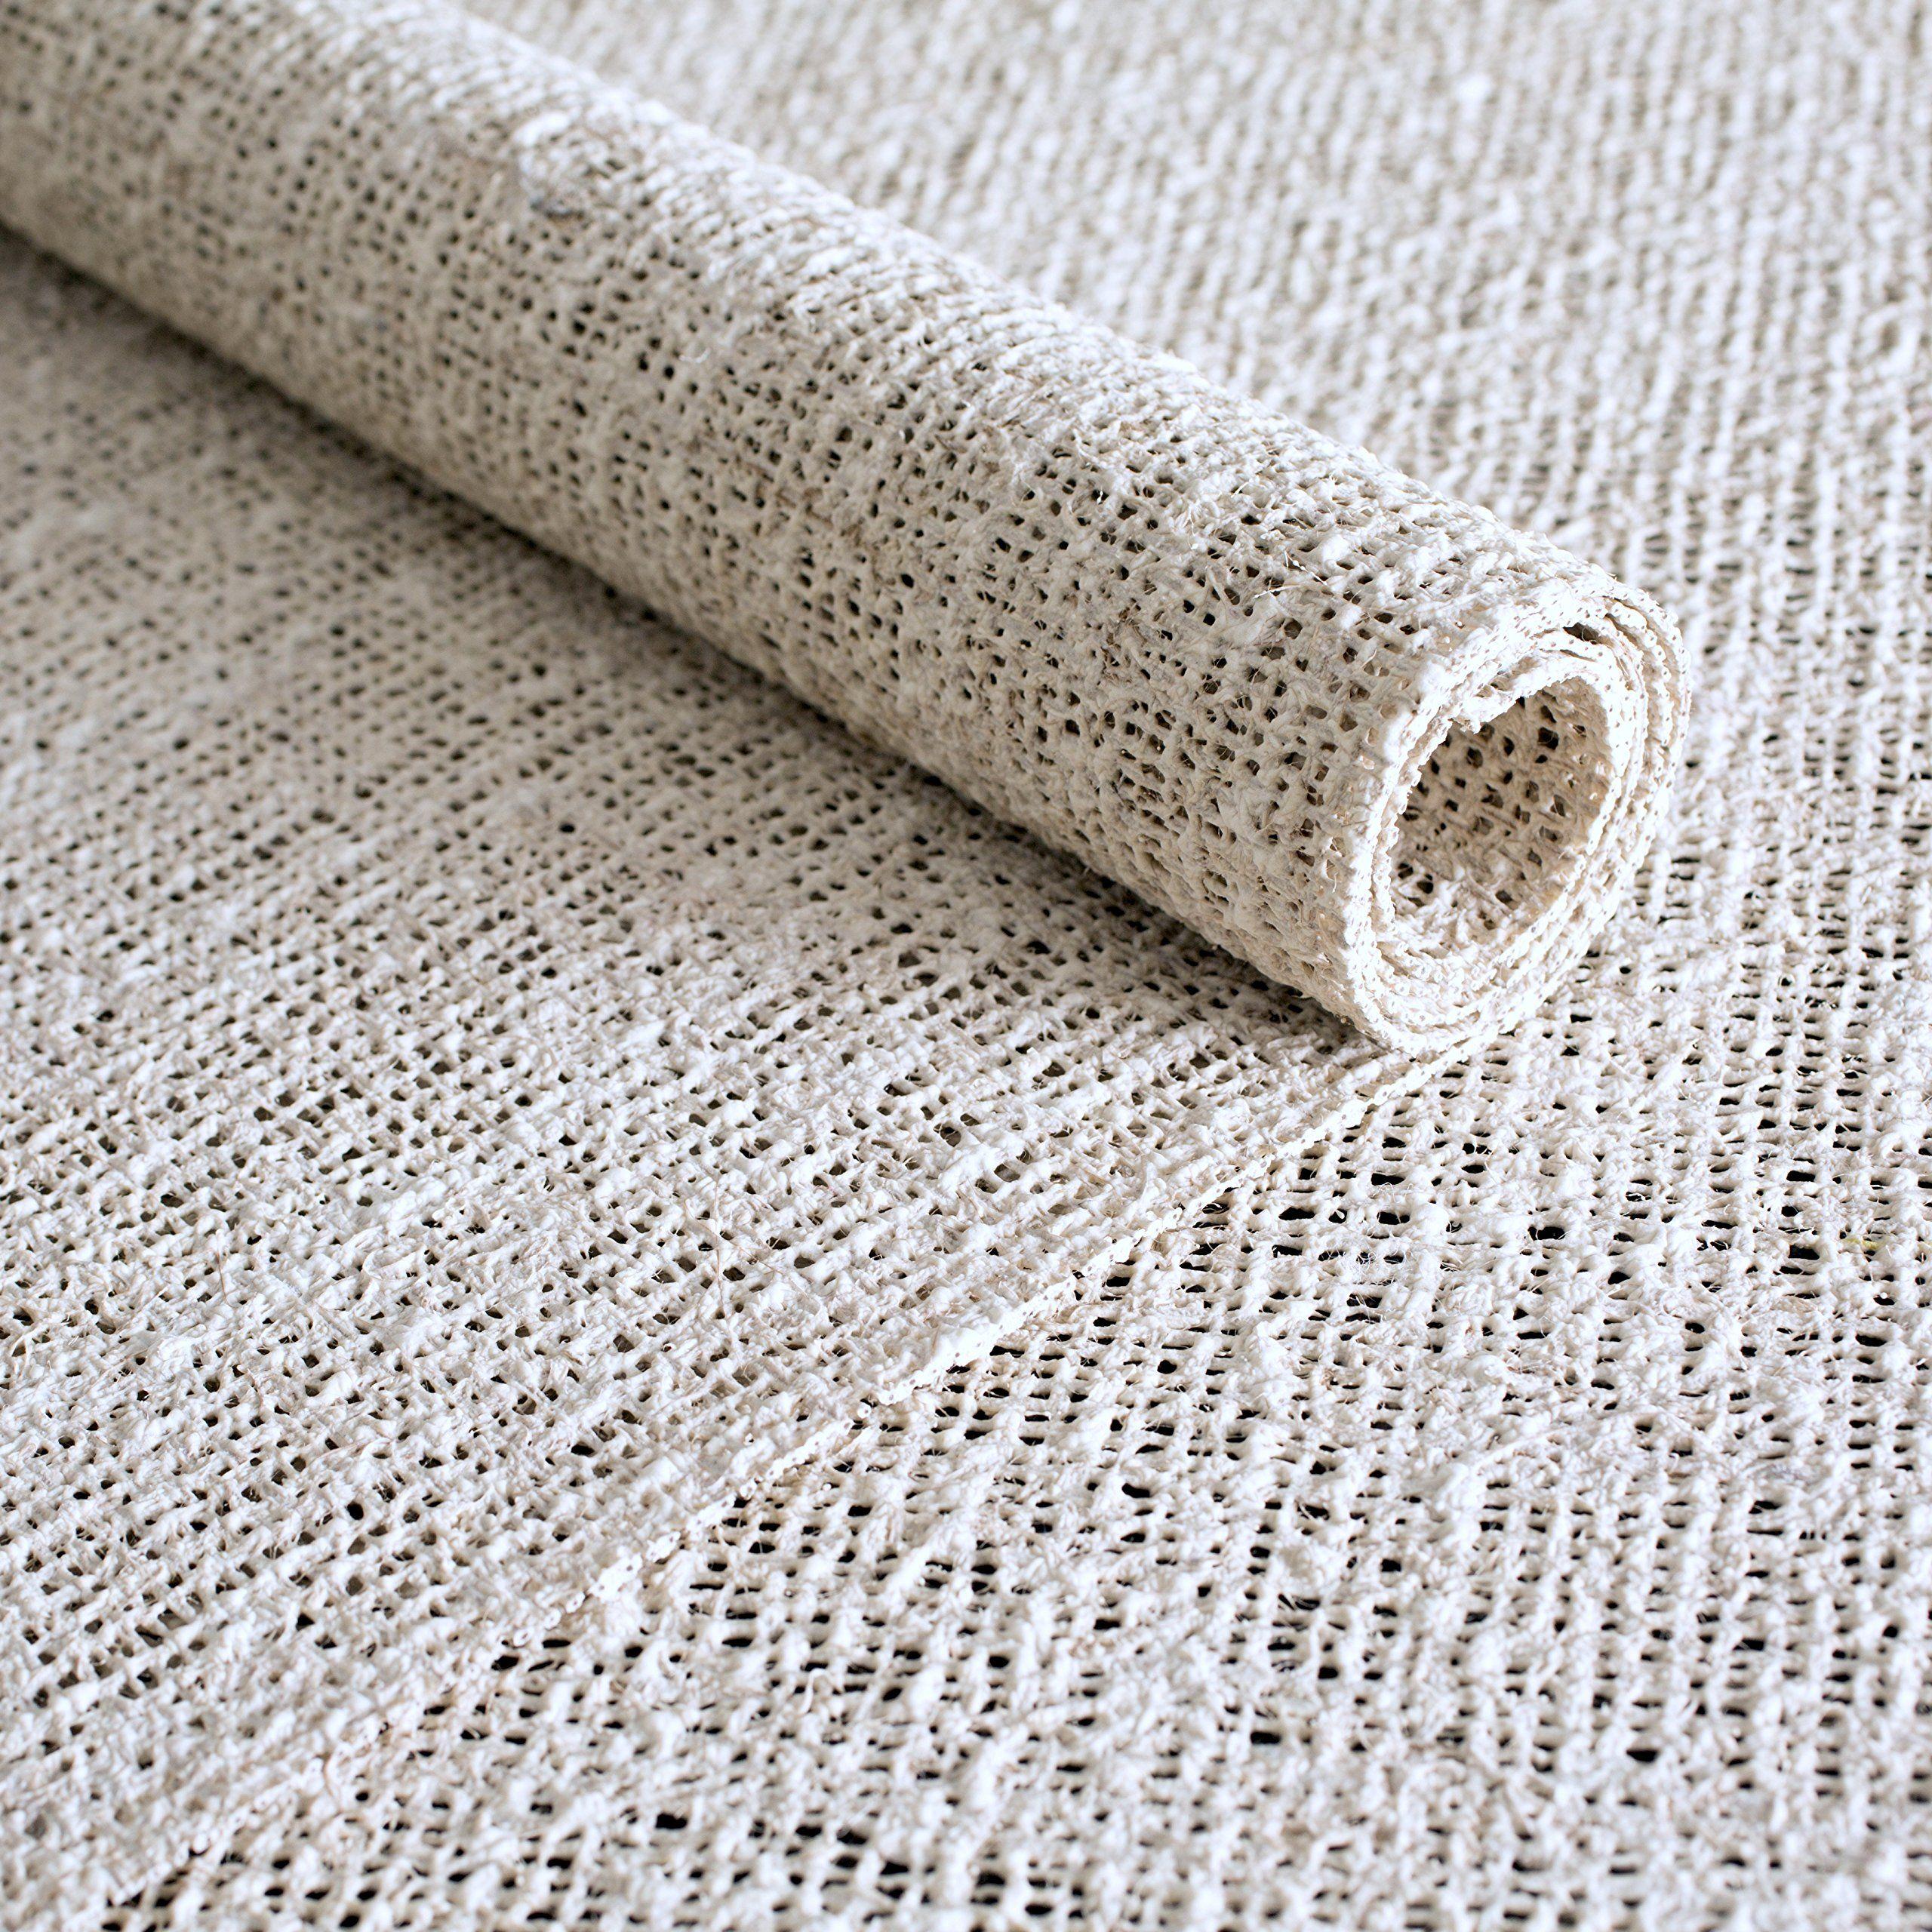 rug pad usa nature's grip ecofriendly jute  natural rubber non  - rug pad usa nature's grip ecofriendly jute  natural rubber non